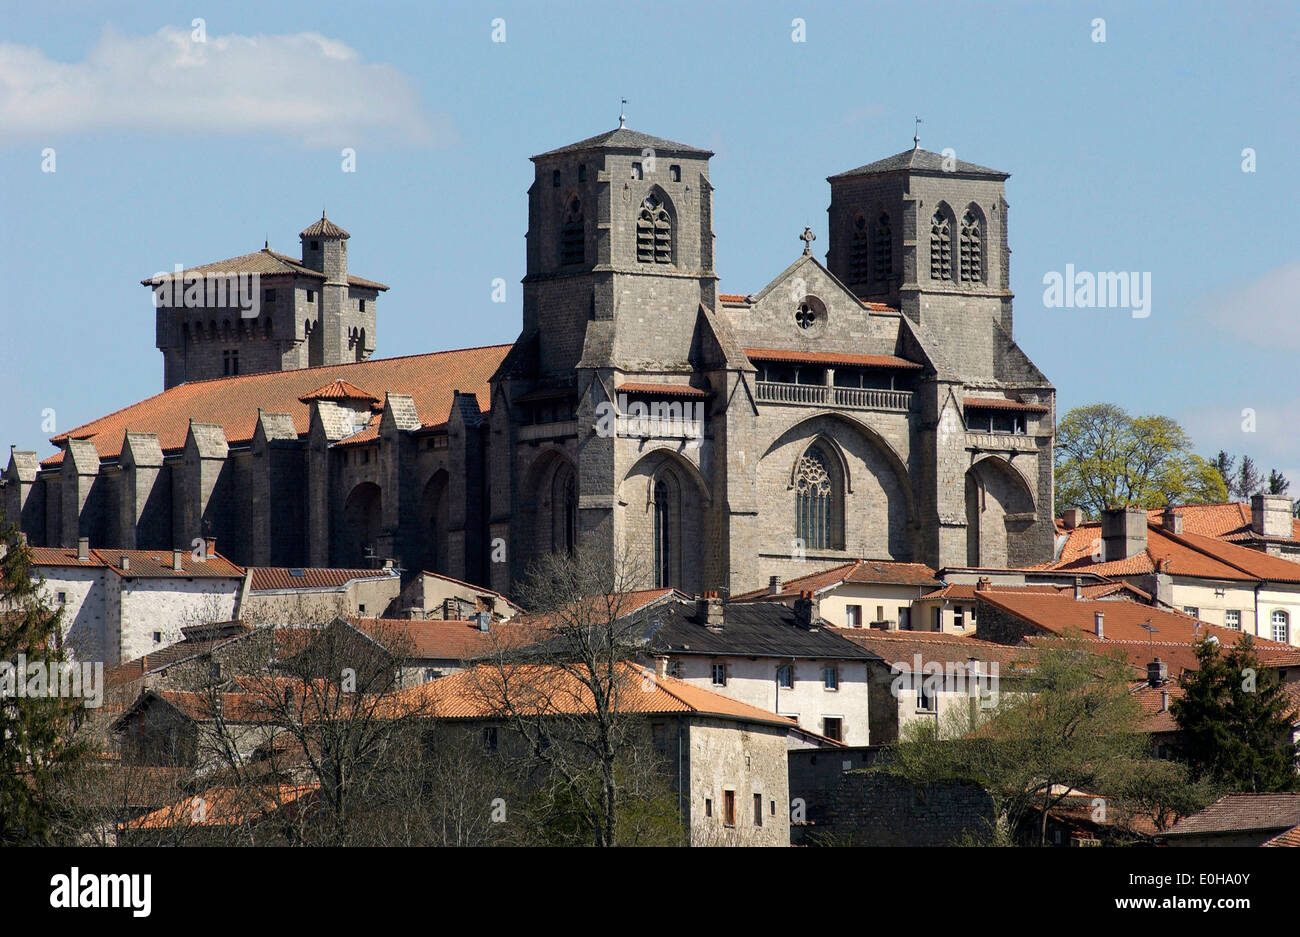 Abbey of La Chaise Dieu and its village, Haute Loire, Auvergne, France, Europe - Stock Image